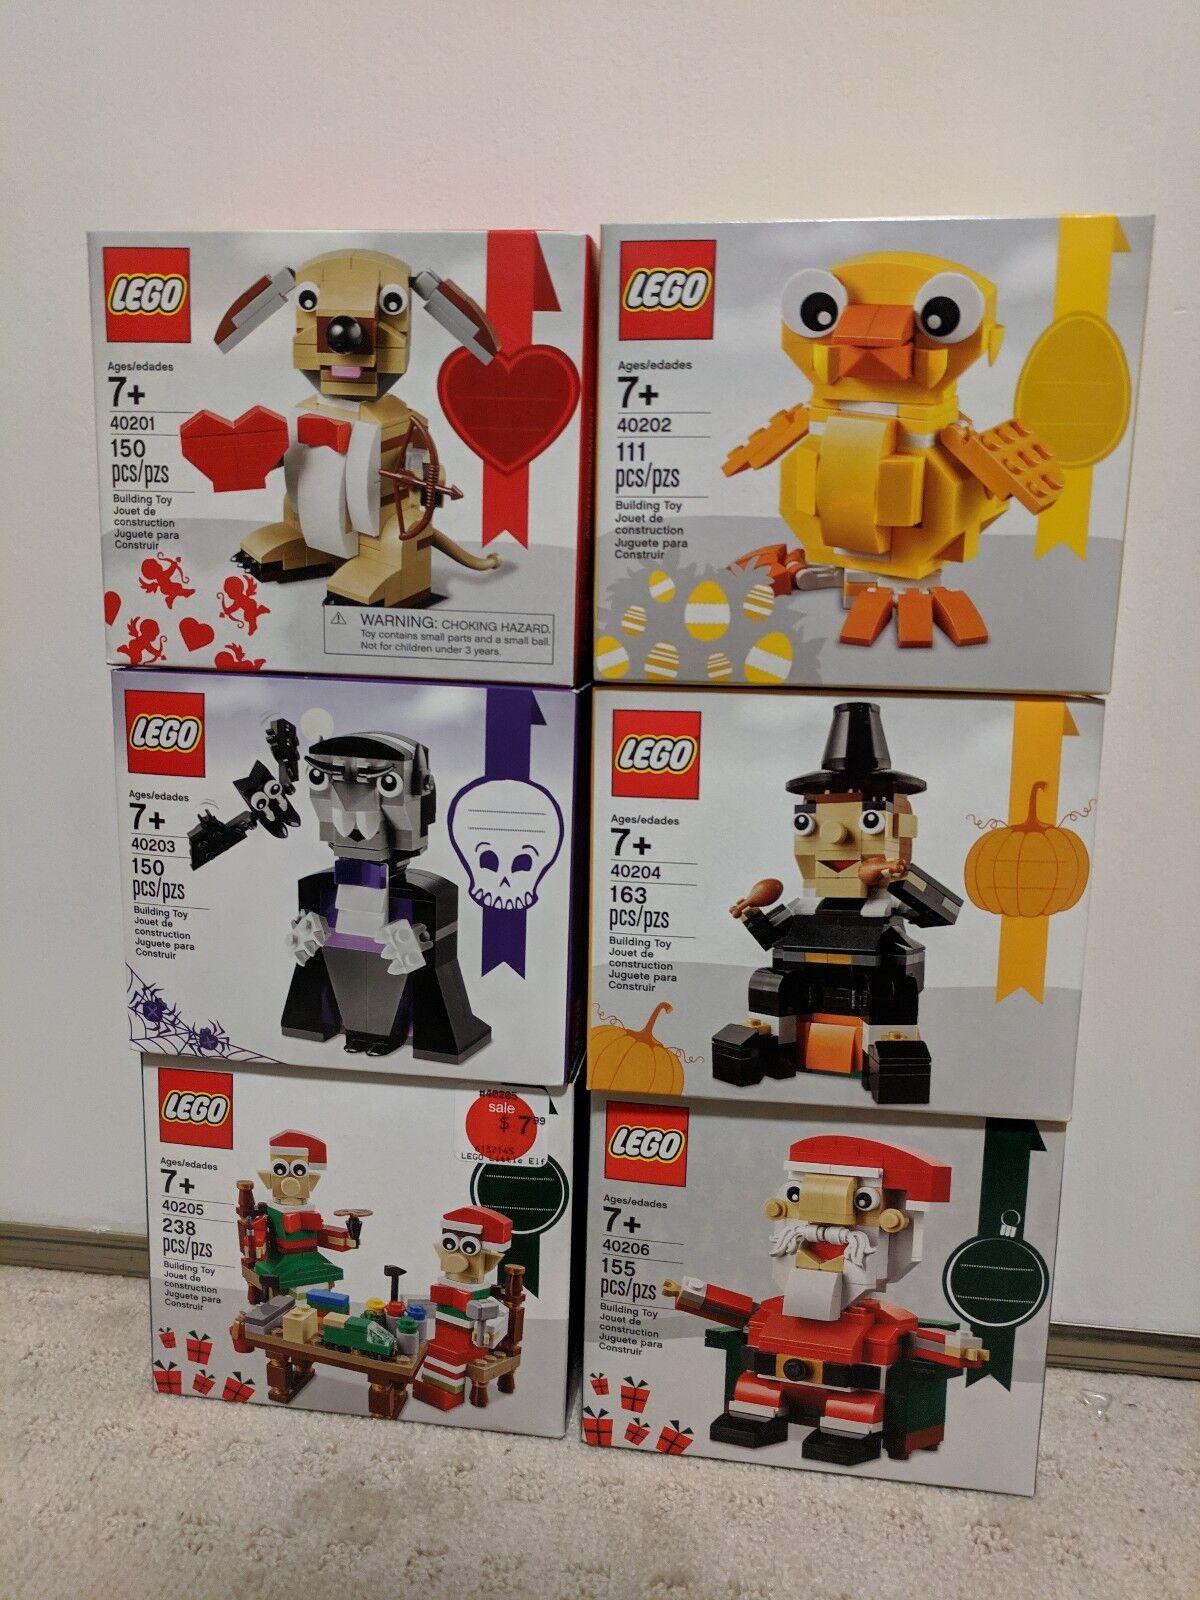 Lego Lego Lego 40201 40202 40203 40204 40205 40206 Valentine Easter Halloween Christmas 52b205